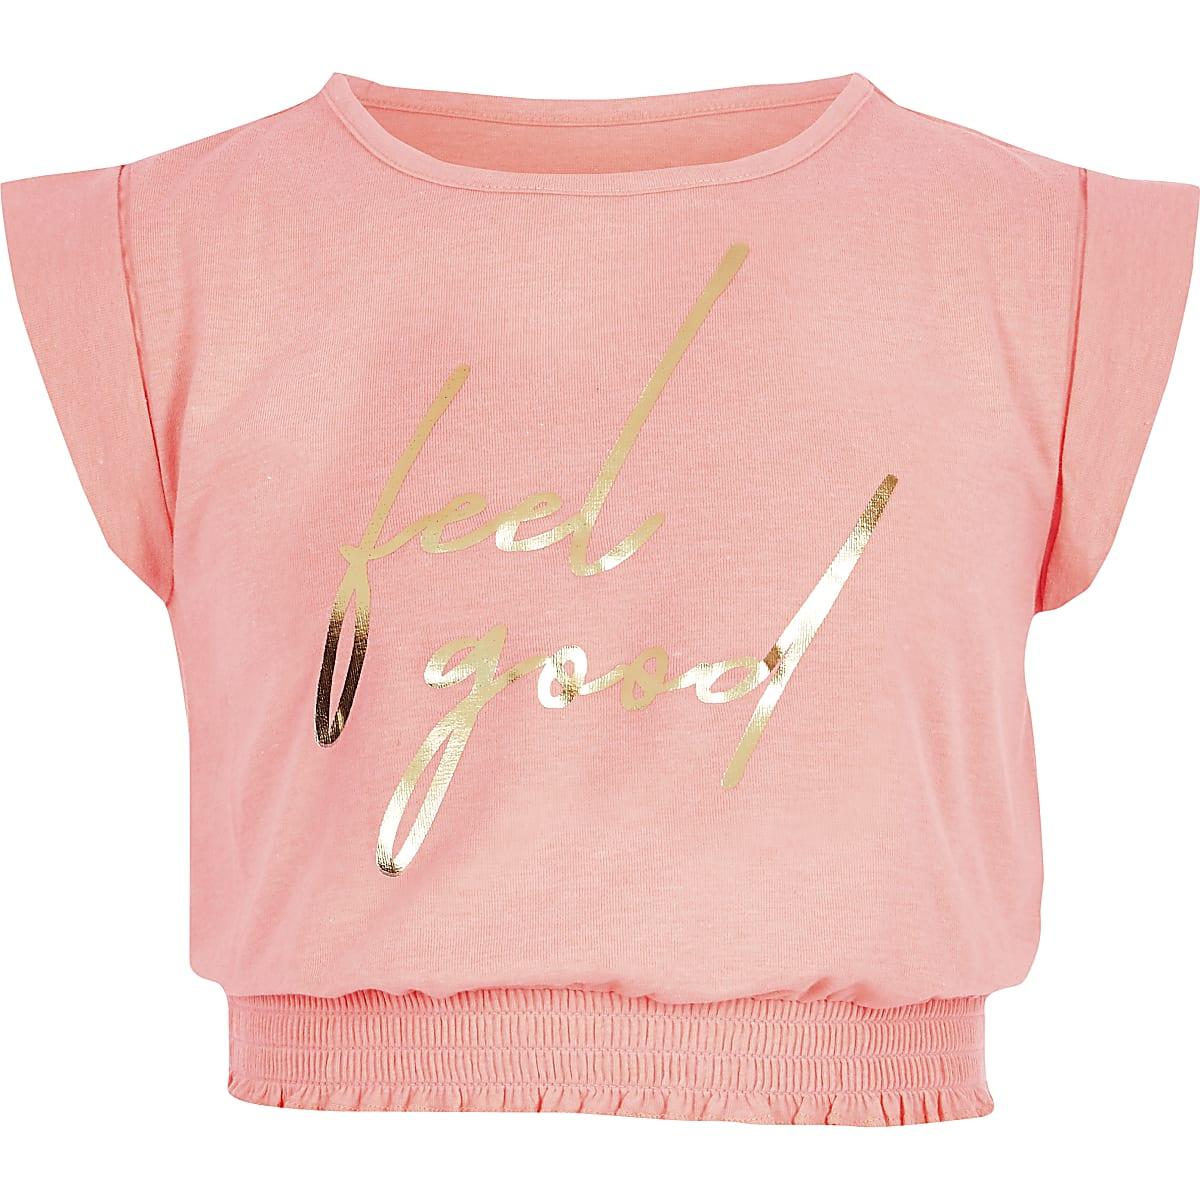 Girls coral 'Feel good' T-shirt